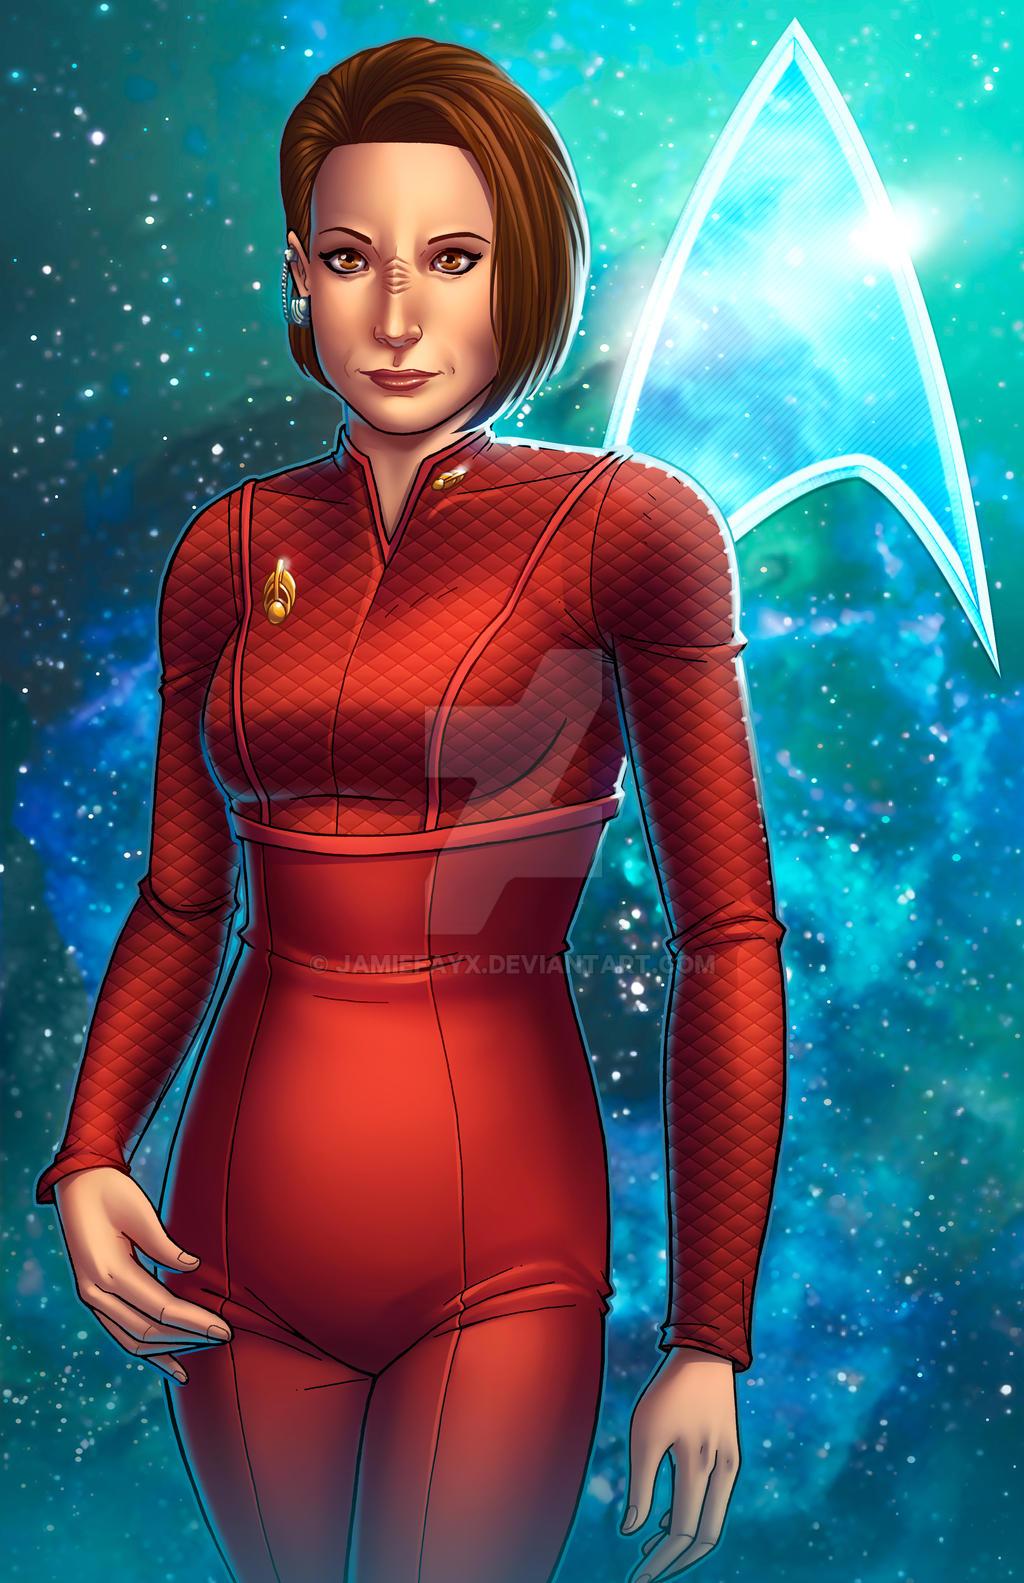 Col. Kira Nerys - Star Trek: Deep Space Nine by JamieFayX